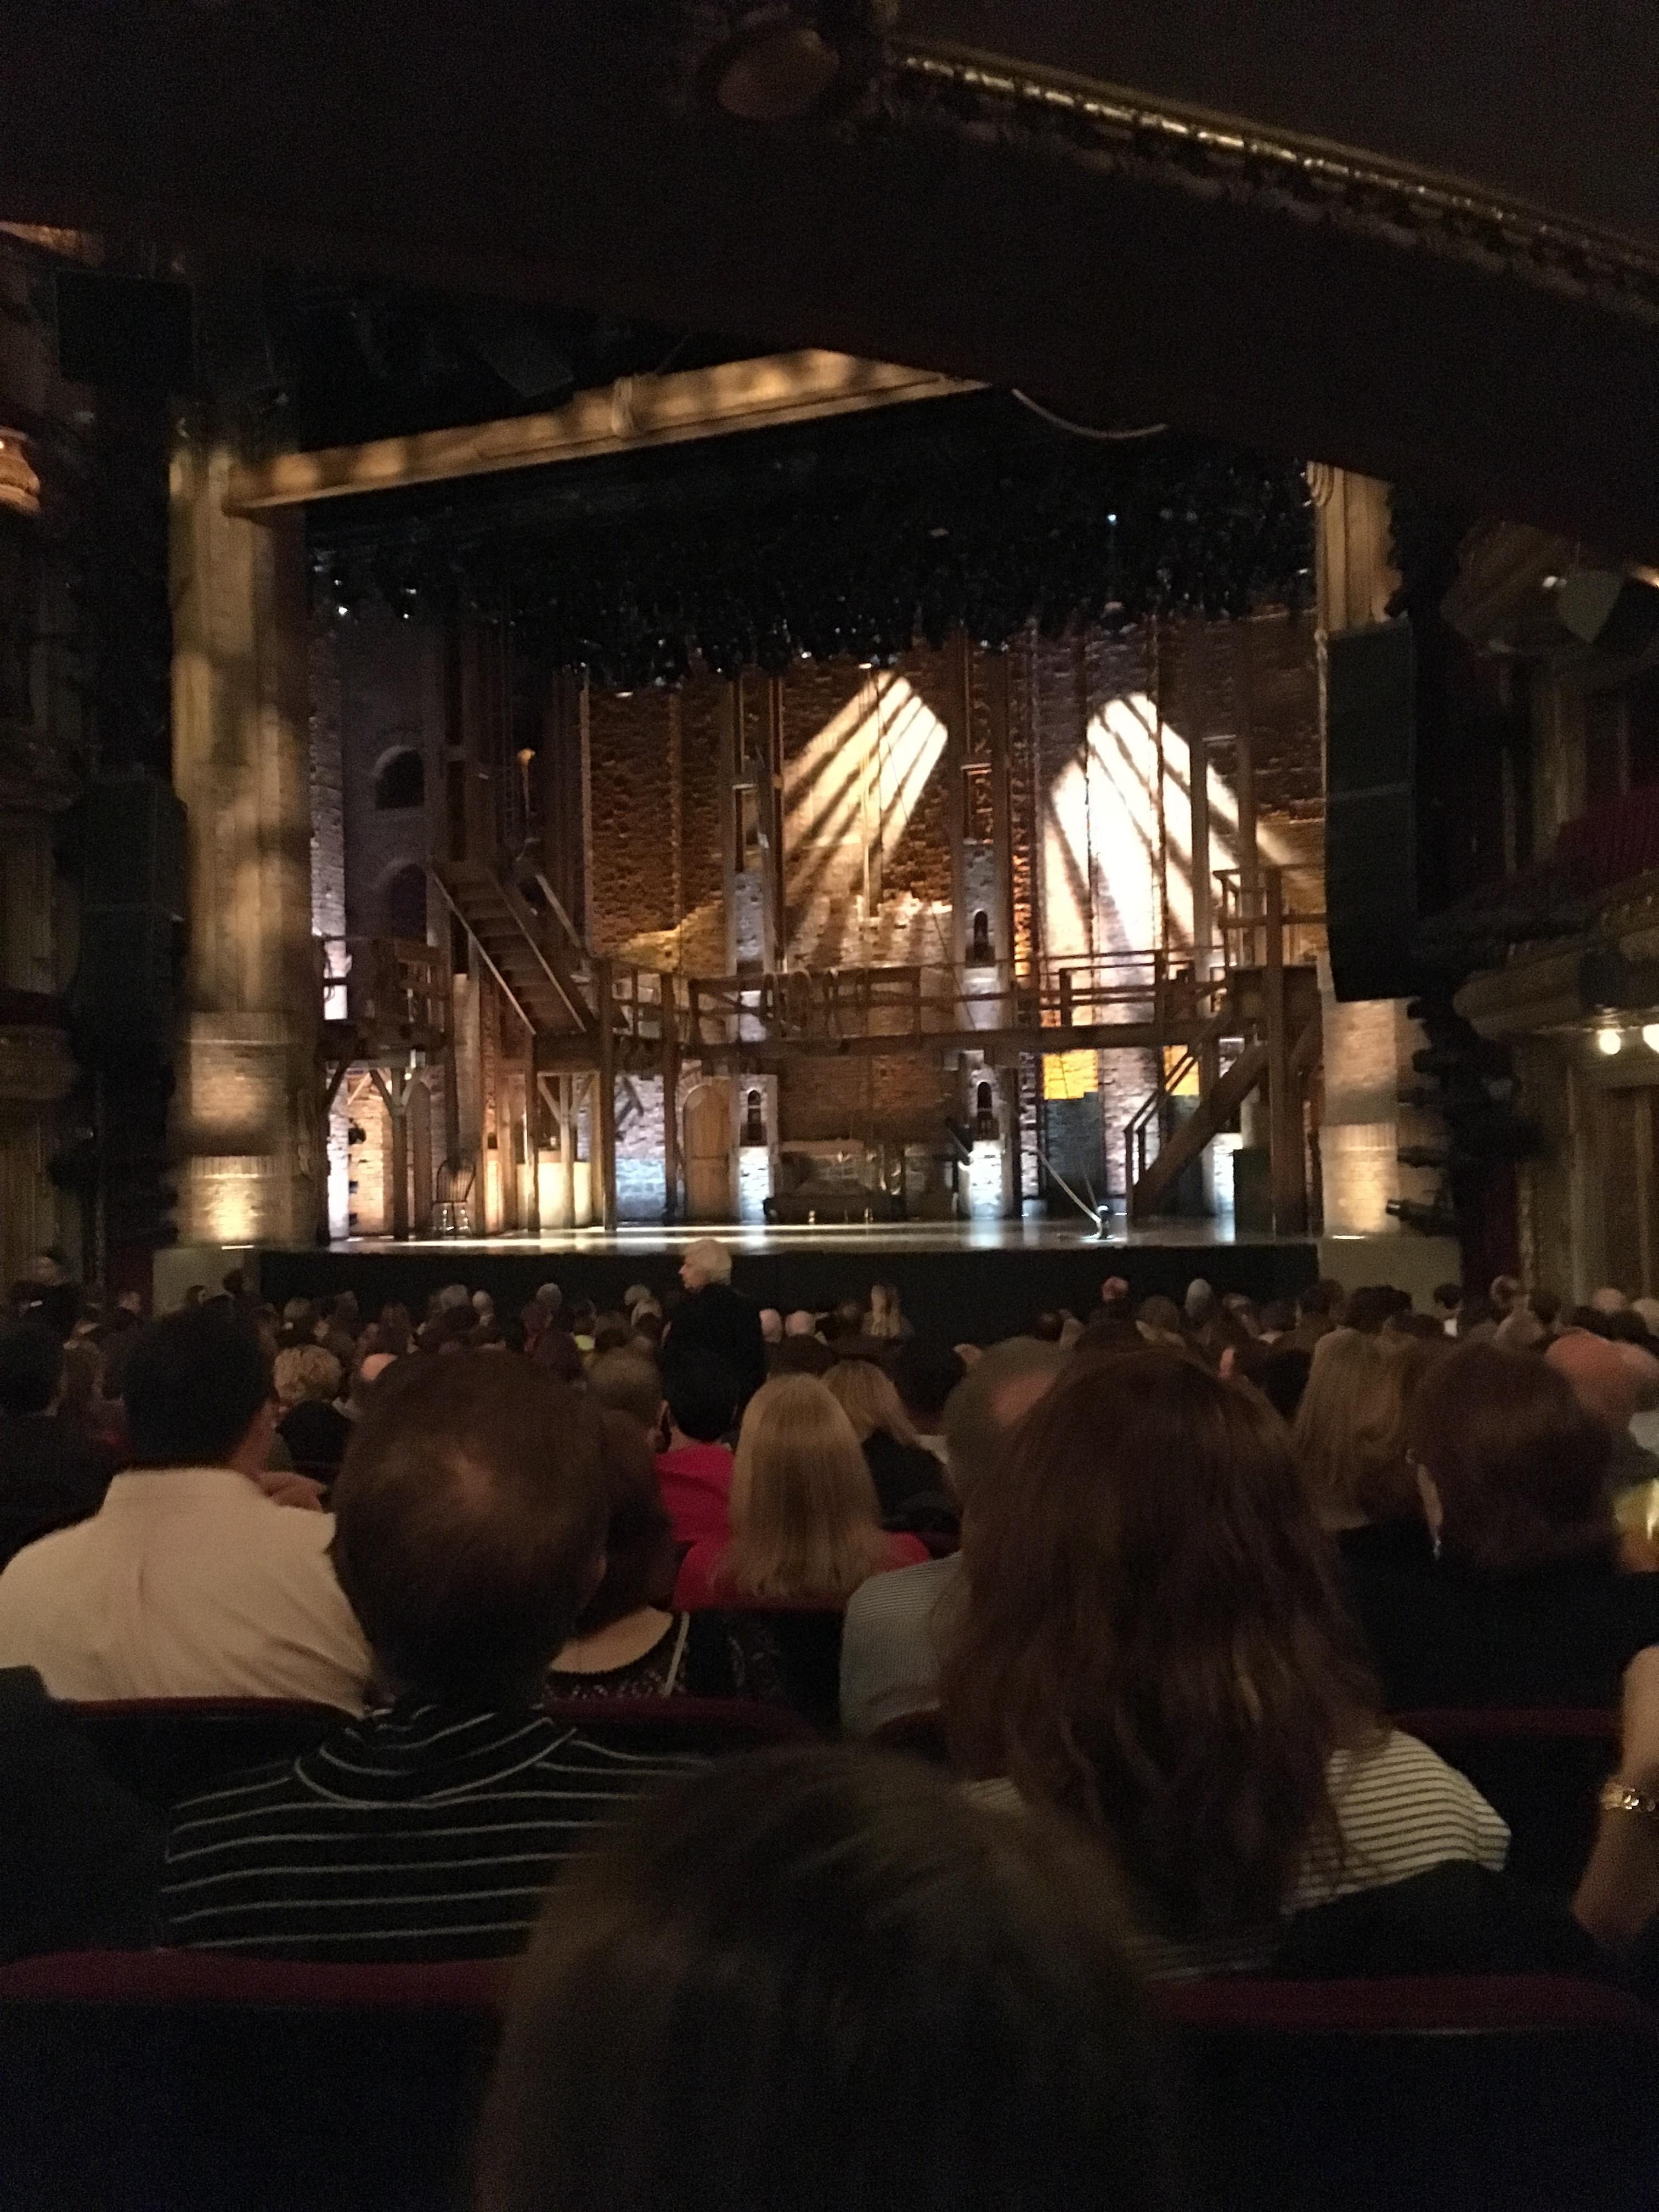 CIBC Theatre Section Orchestra R Row U Seat 2,4